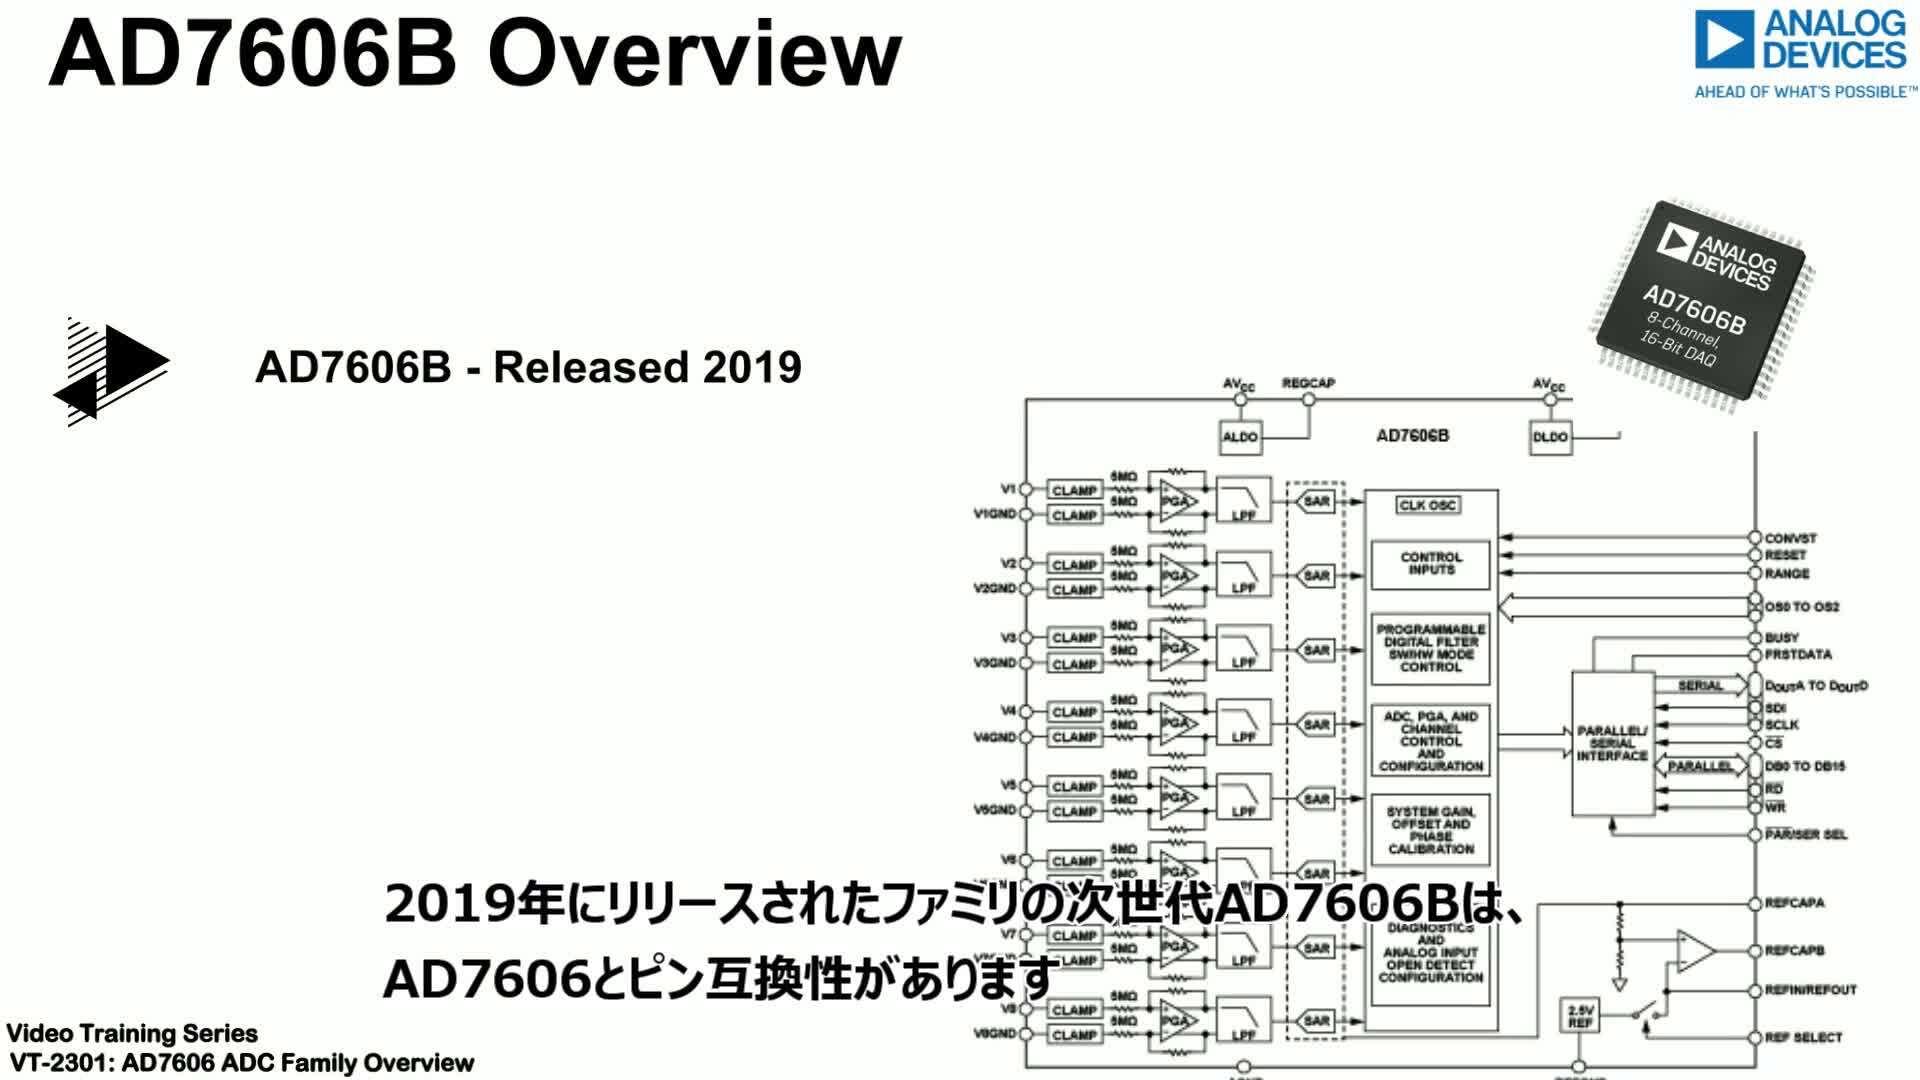 VT-2302:  AD7606ファミリーのご紹介 プレシジョンADコンバーター